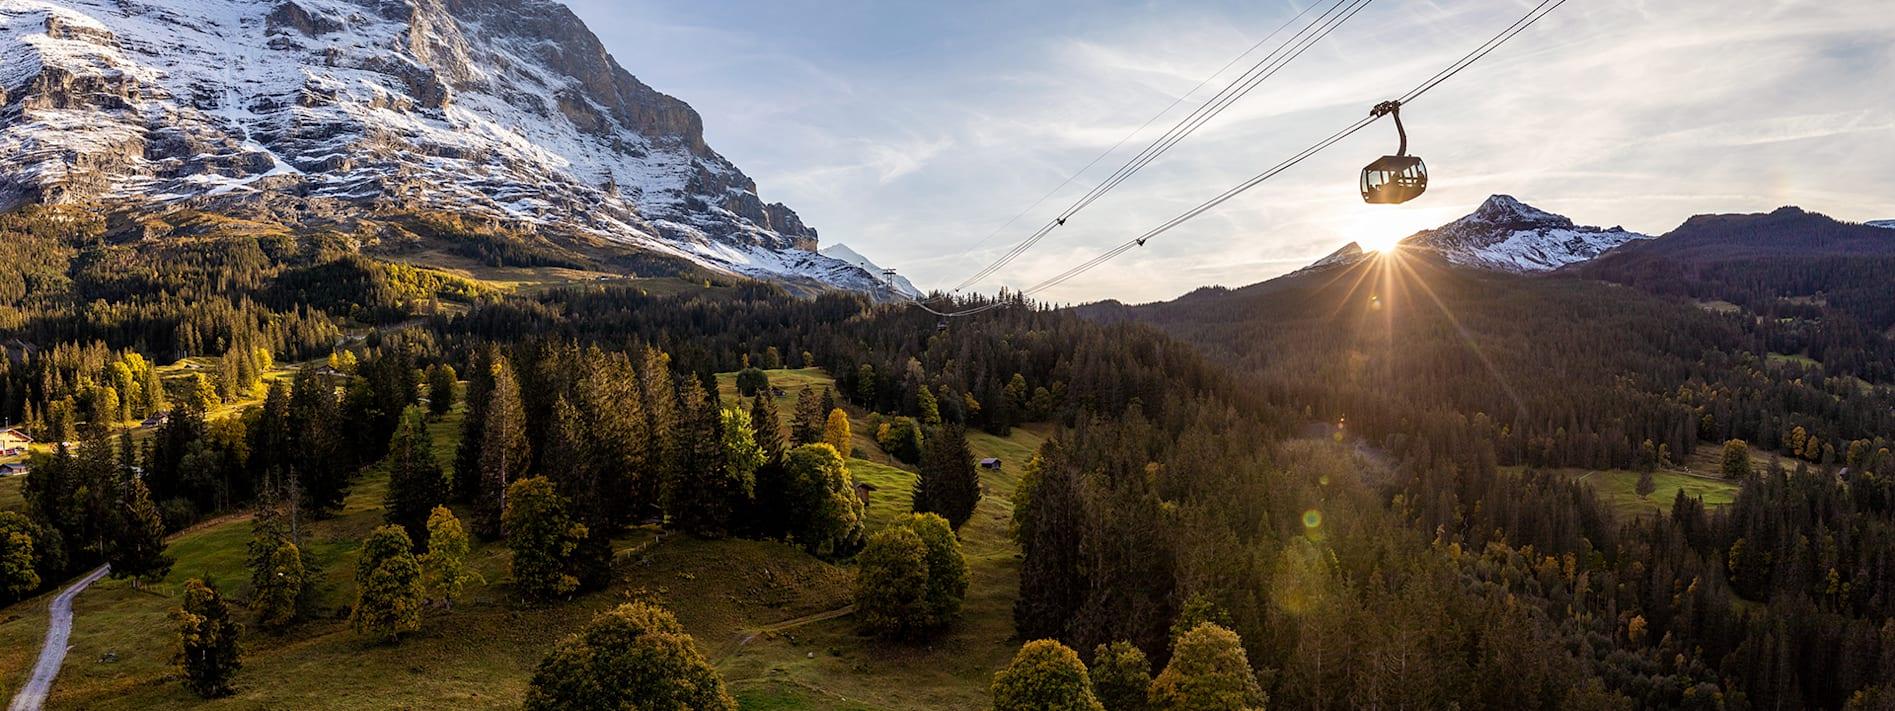 Eiger Express Grindelwald Eigernordwand Panorama Sonnenuntergang